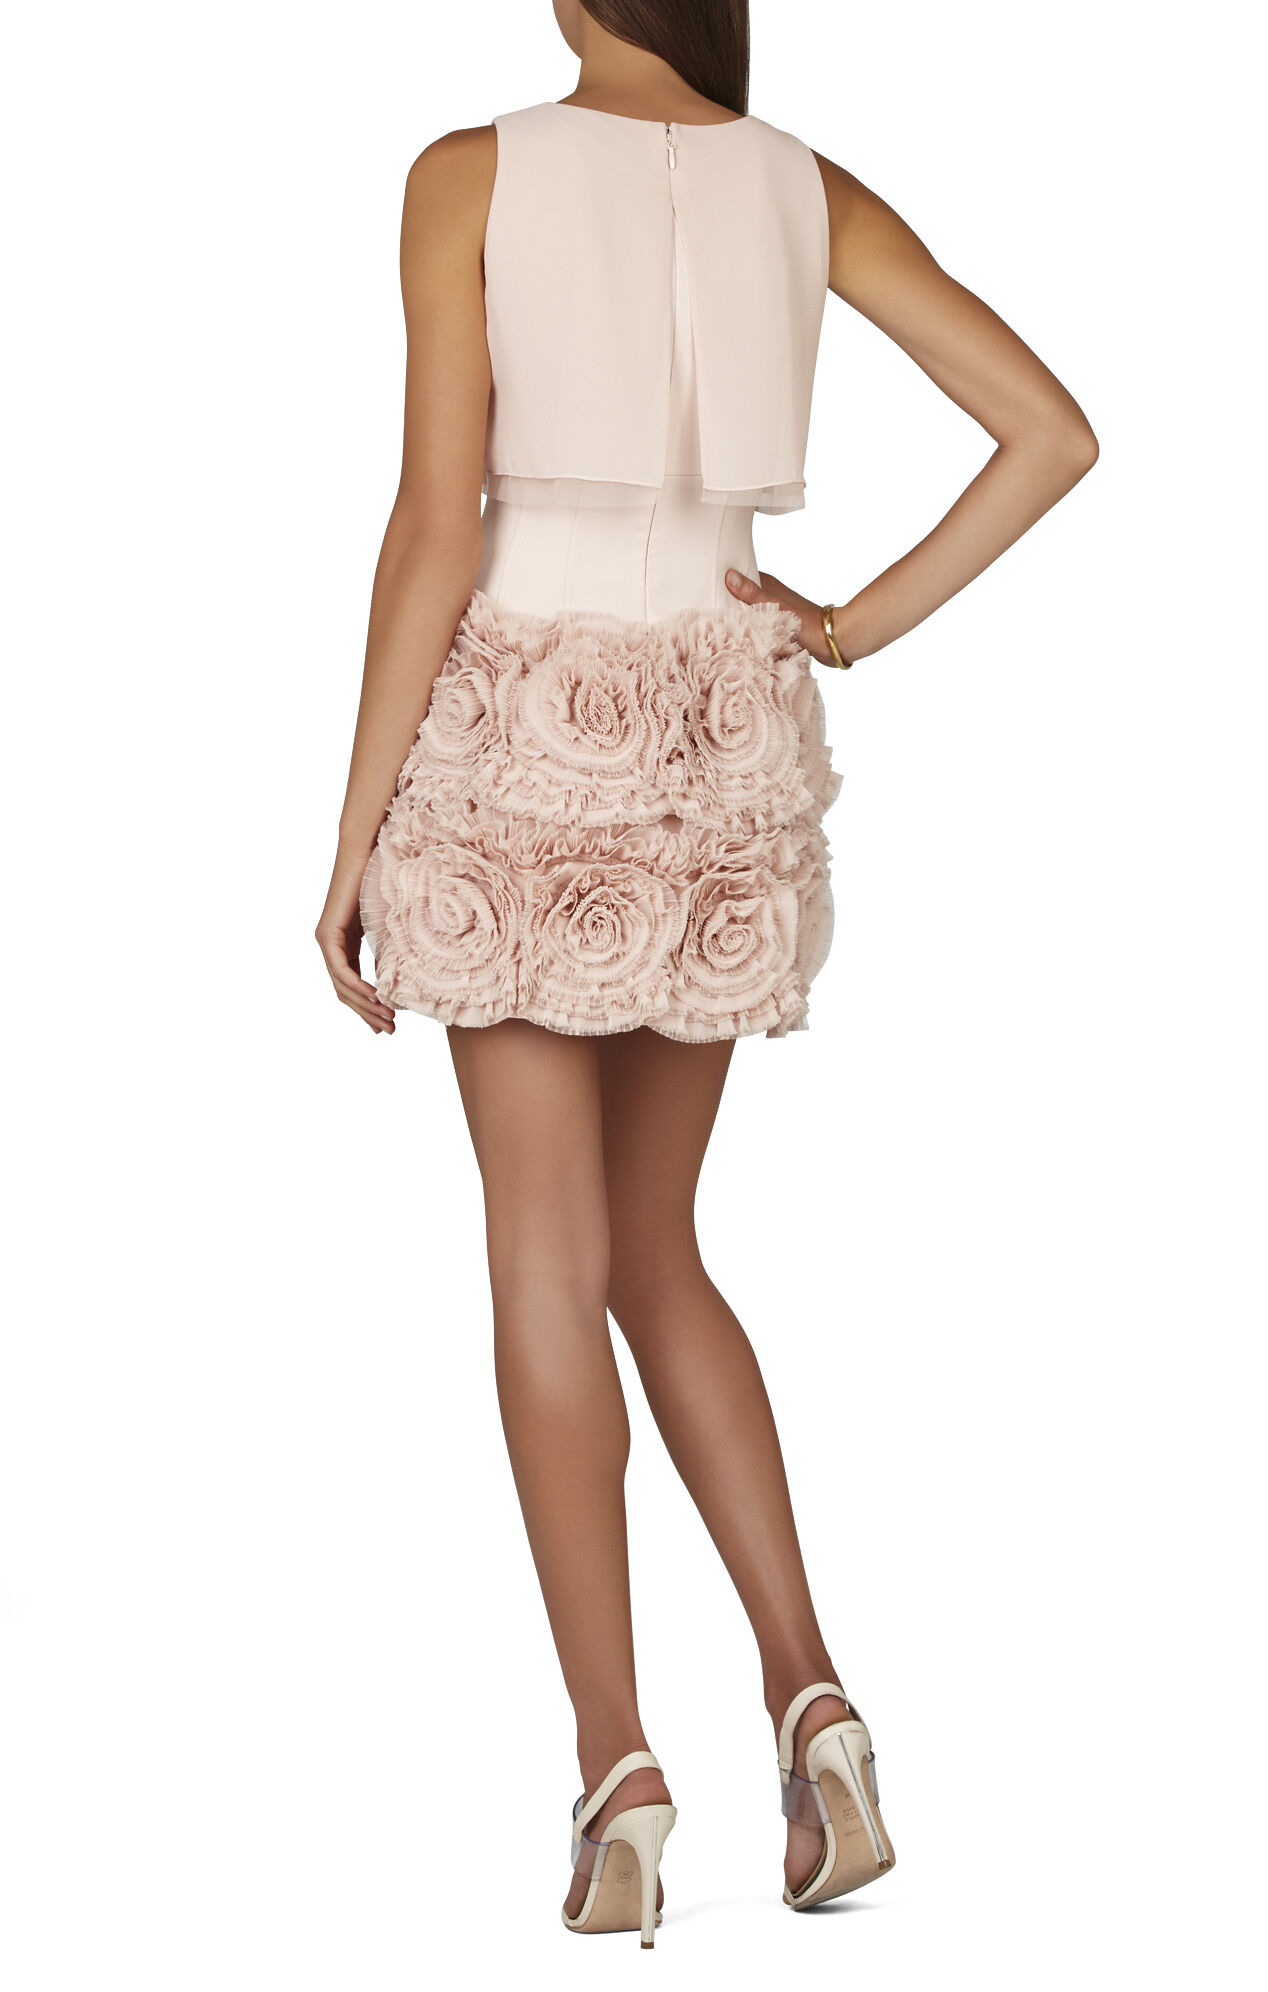 BCBGMAXAZRIA Alia Sleeveless Tiered-Ruffle Skirt Dress | BCBG.com